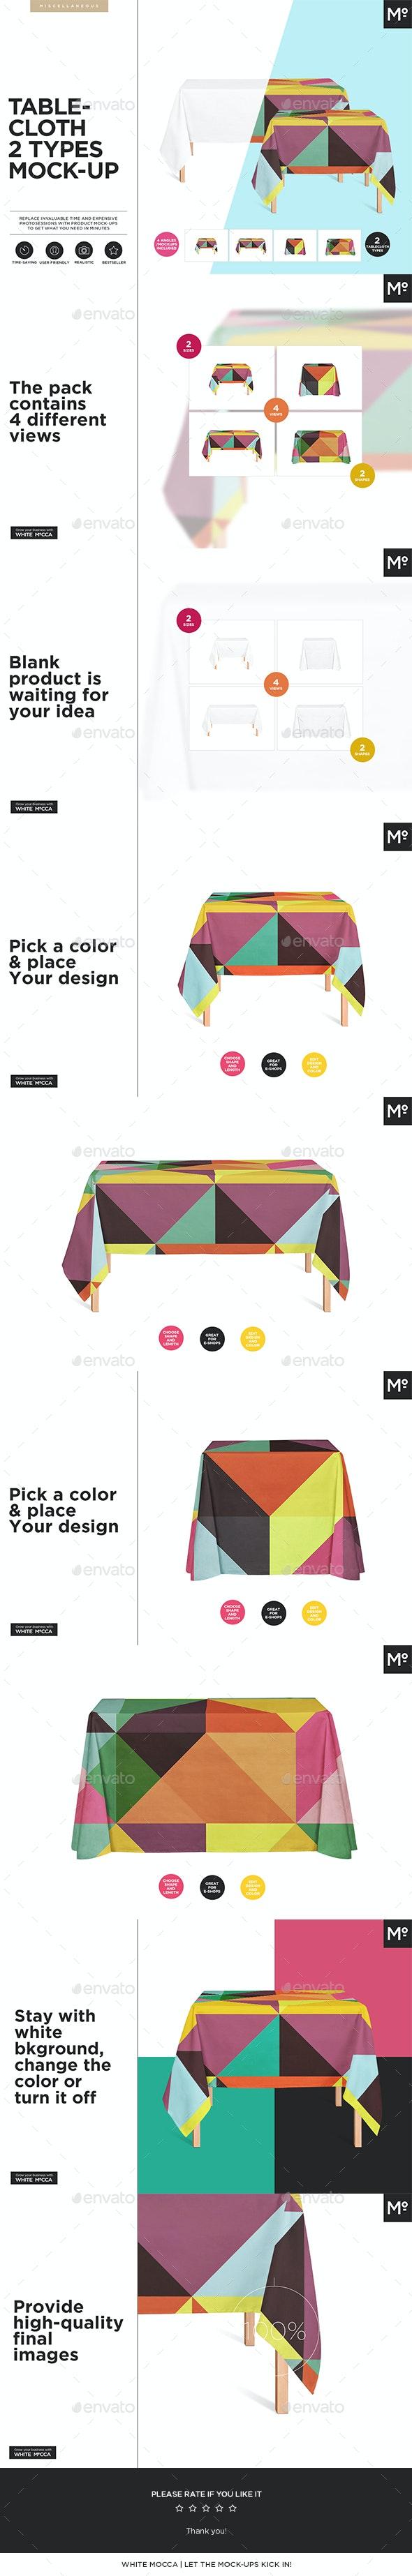 Tablecloth 2 Types Mock-ups Set - Miscellaneous Print